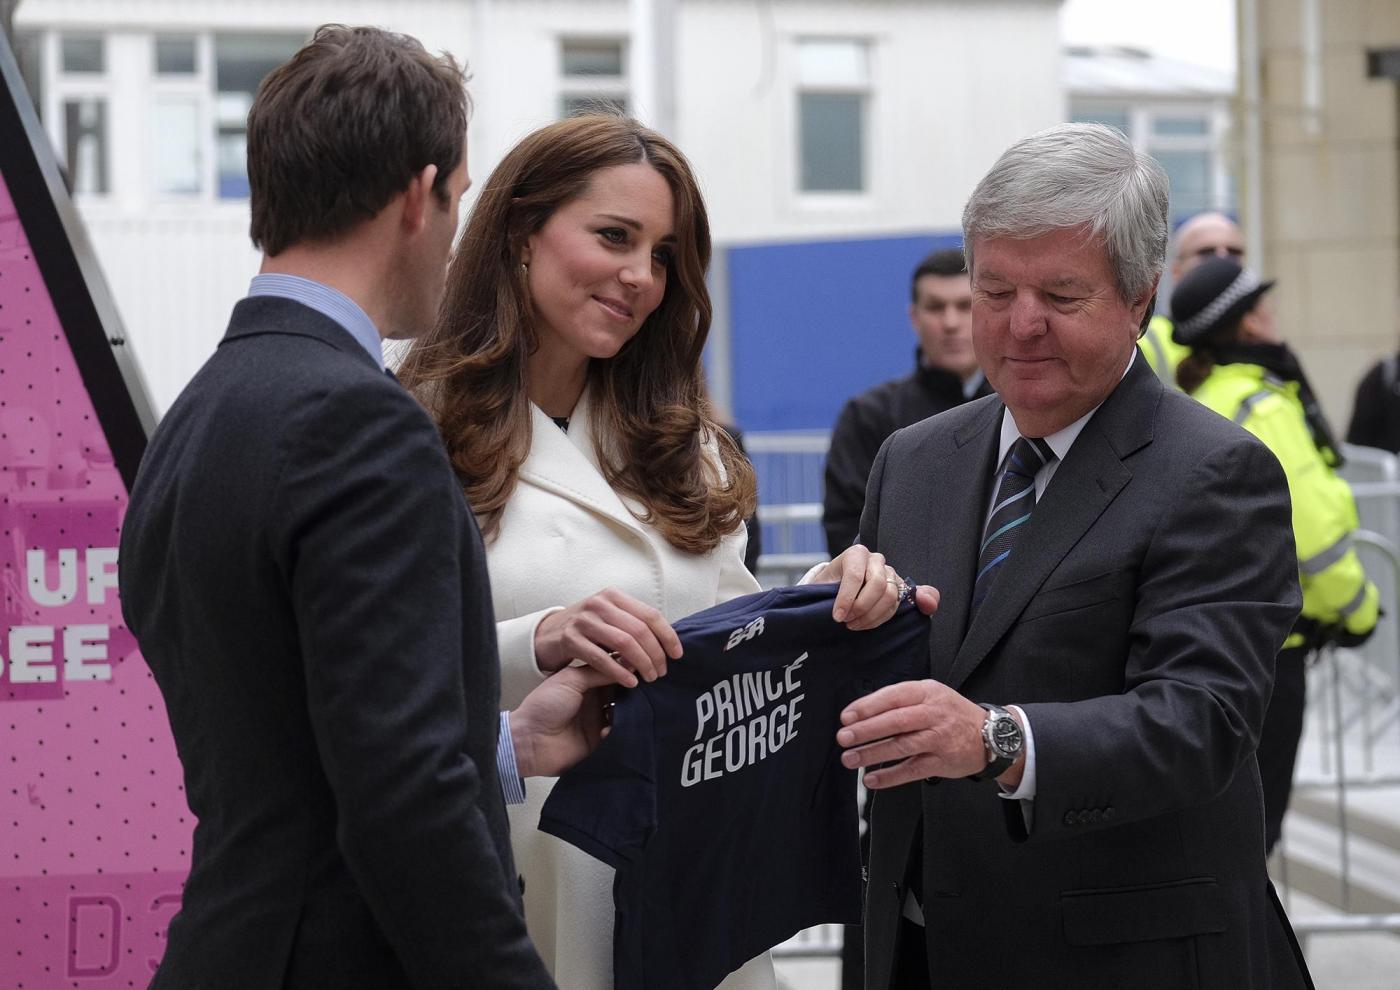 Kate Middleton torna dai Caraibi abbronzata e con un bel pancione 21